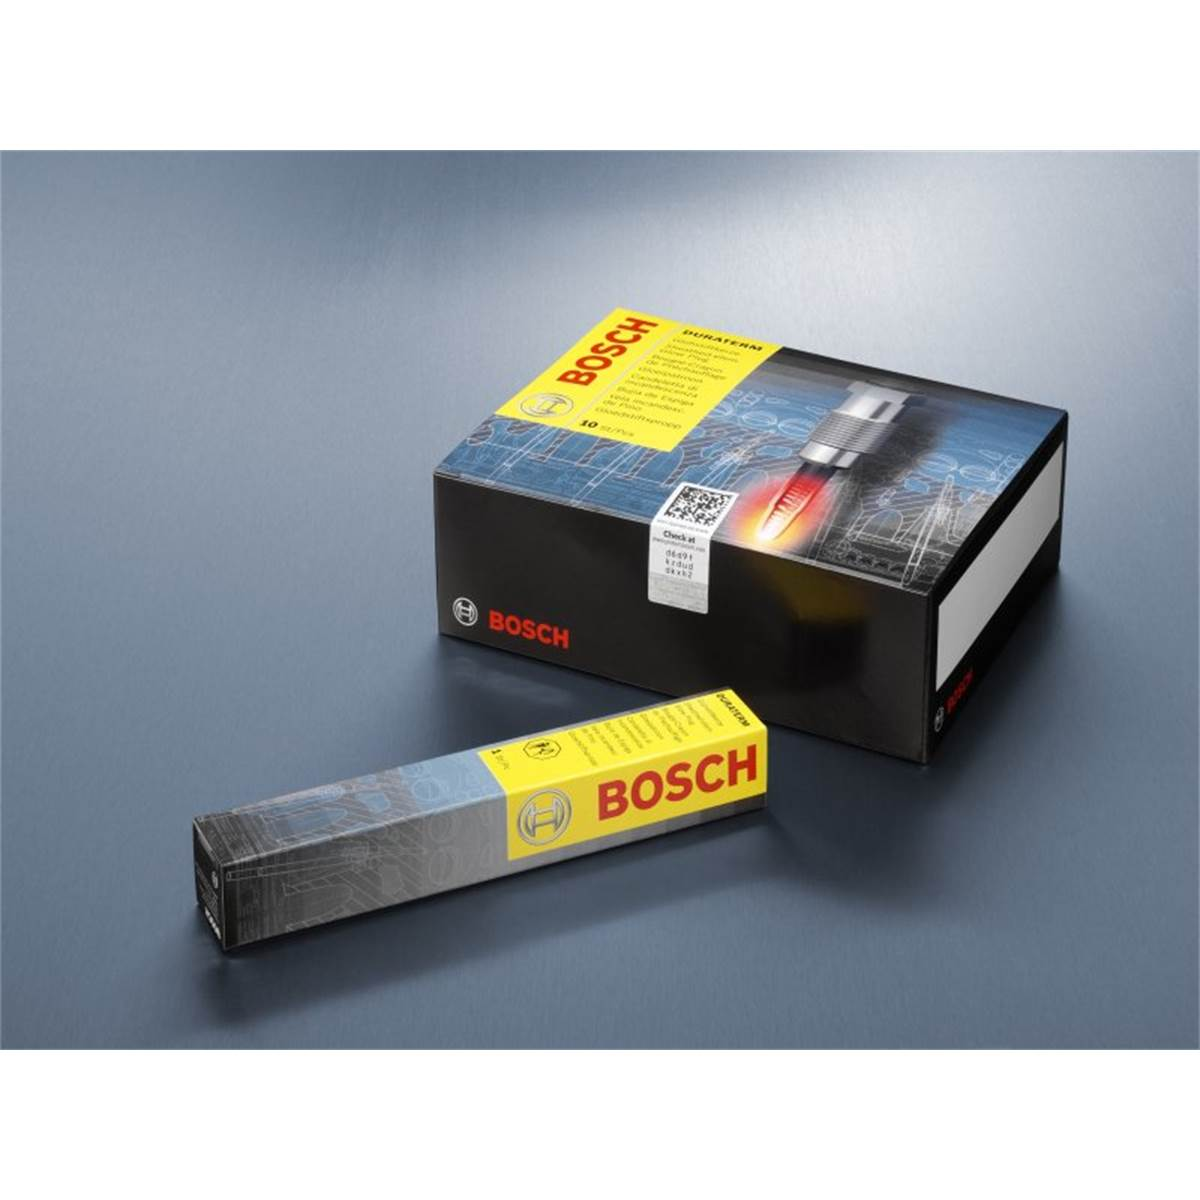 Bougie de préchauffage Bosch N°2020